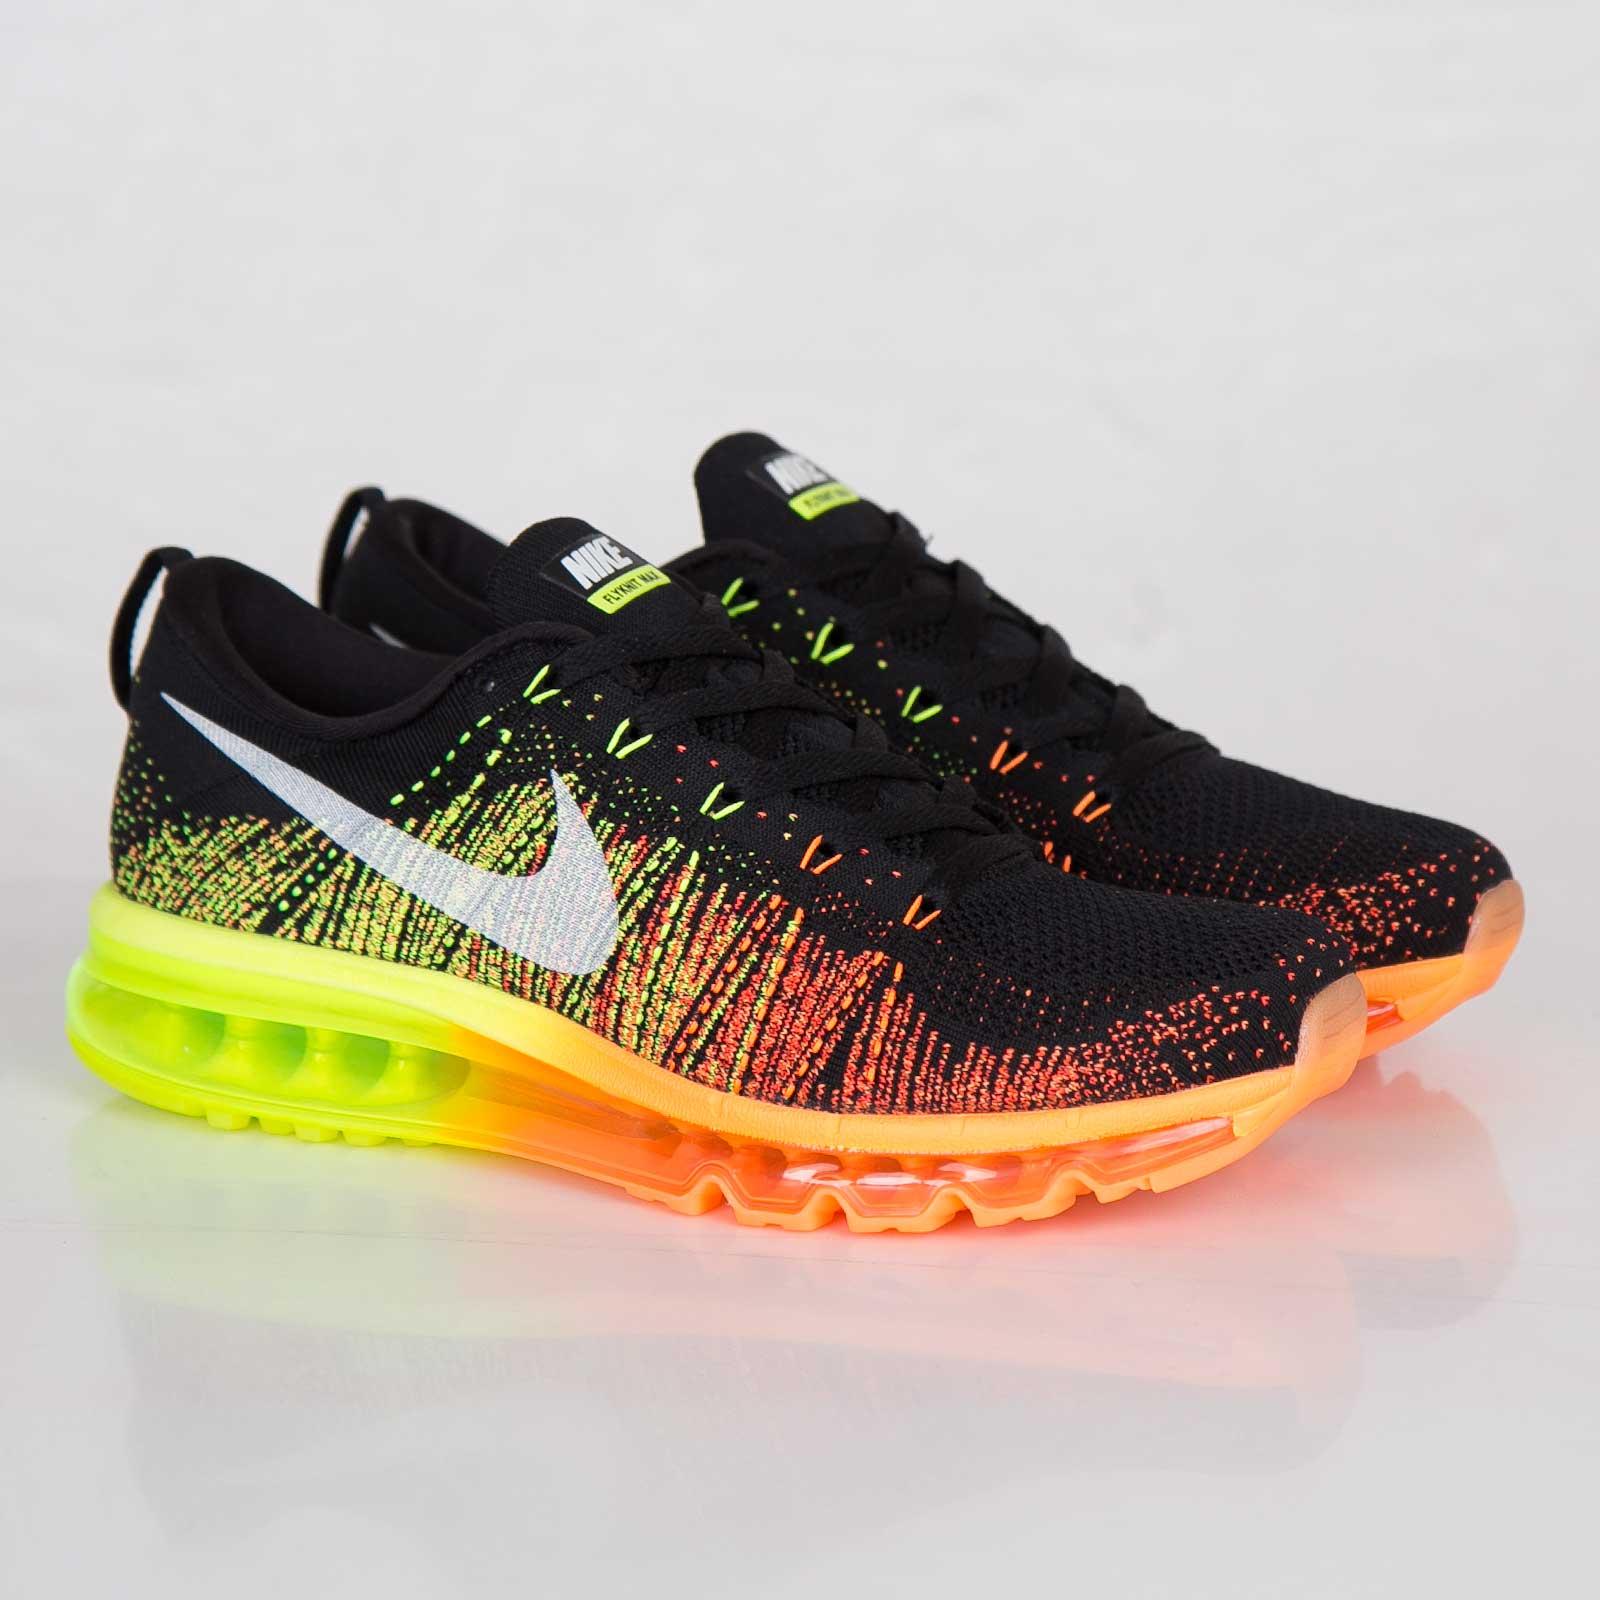 ff293c5192e1 Nike Flyknit Air Max - 620469-018 - Sneakersnstuff